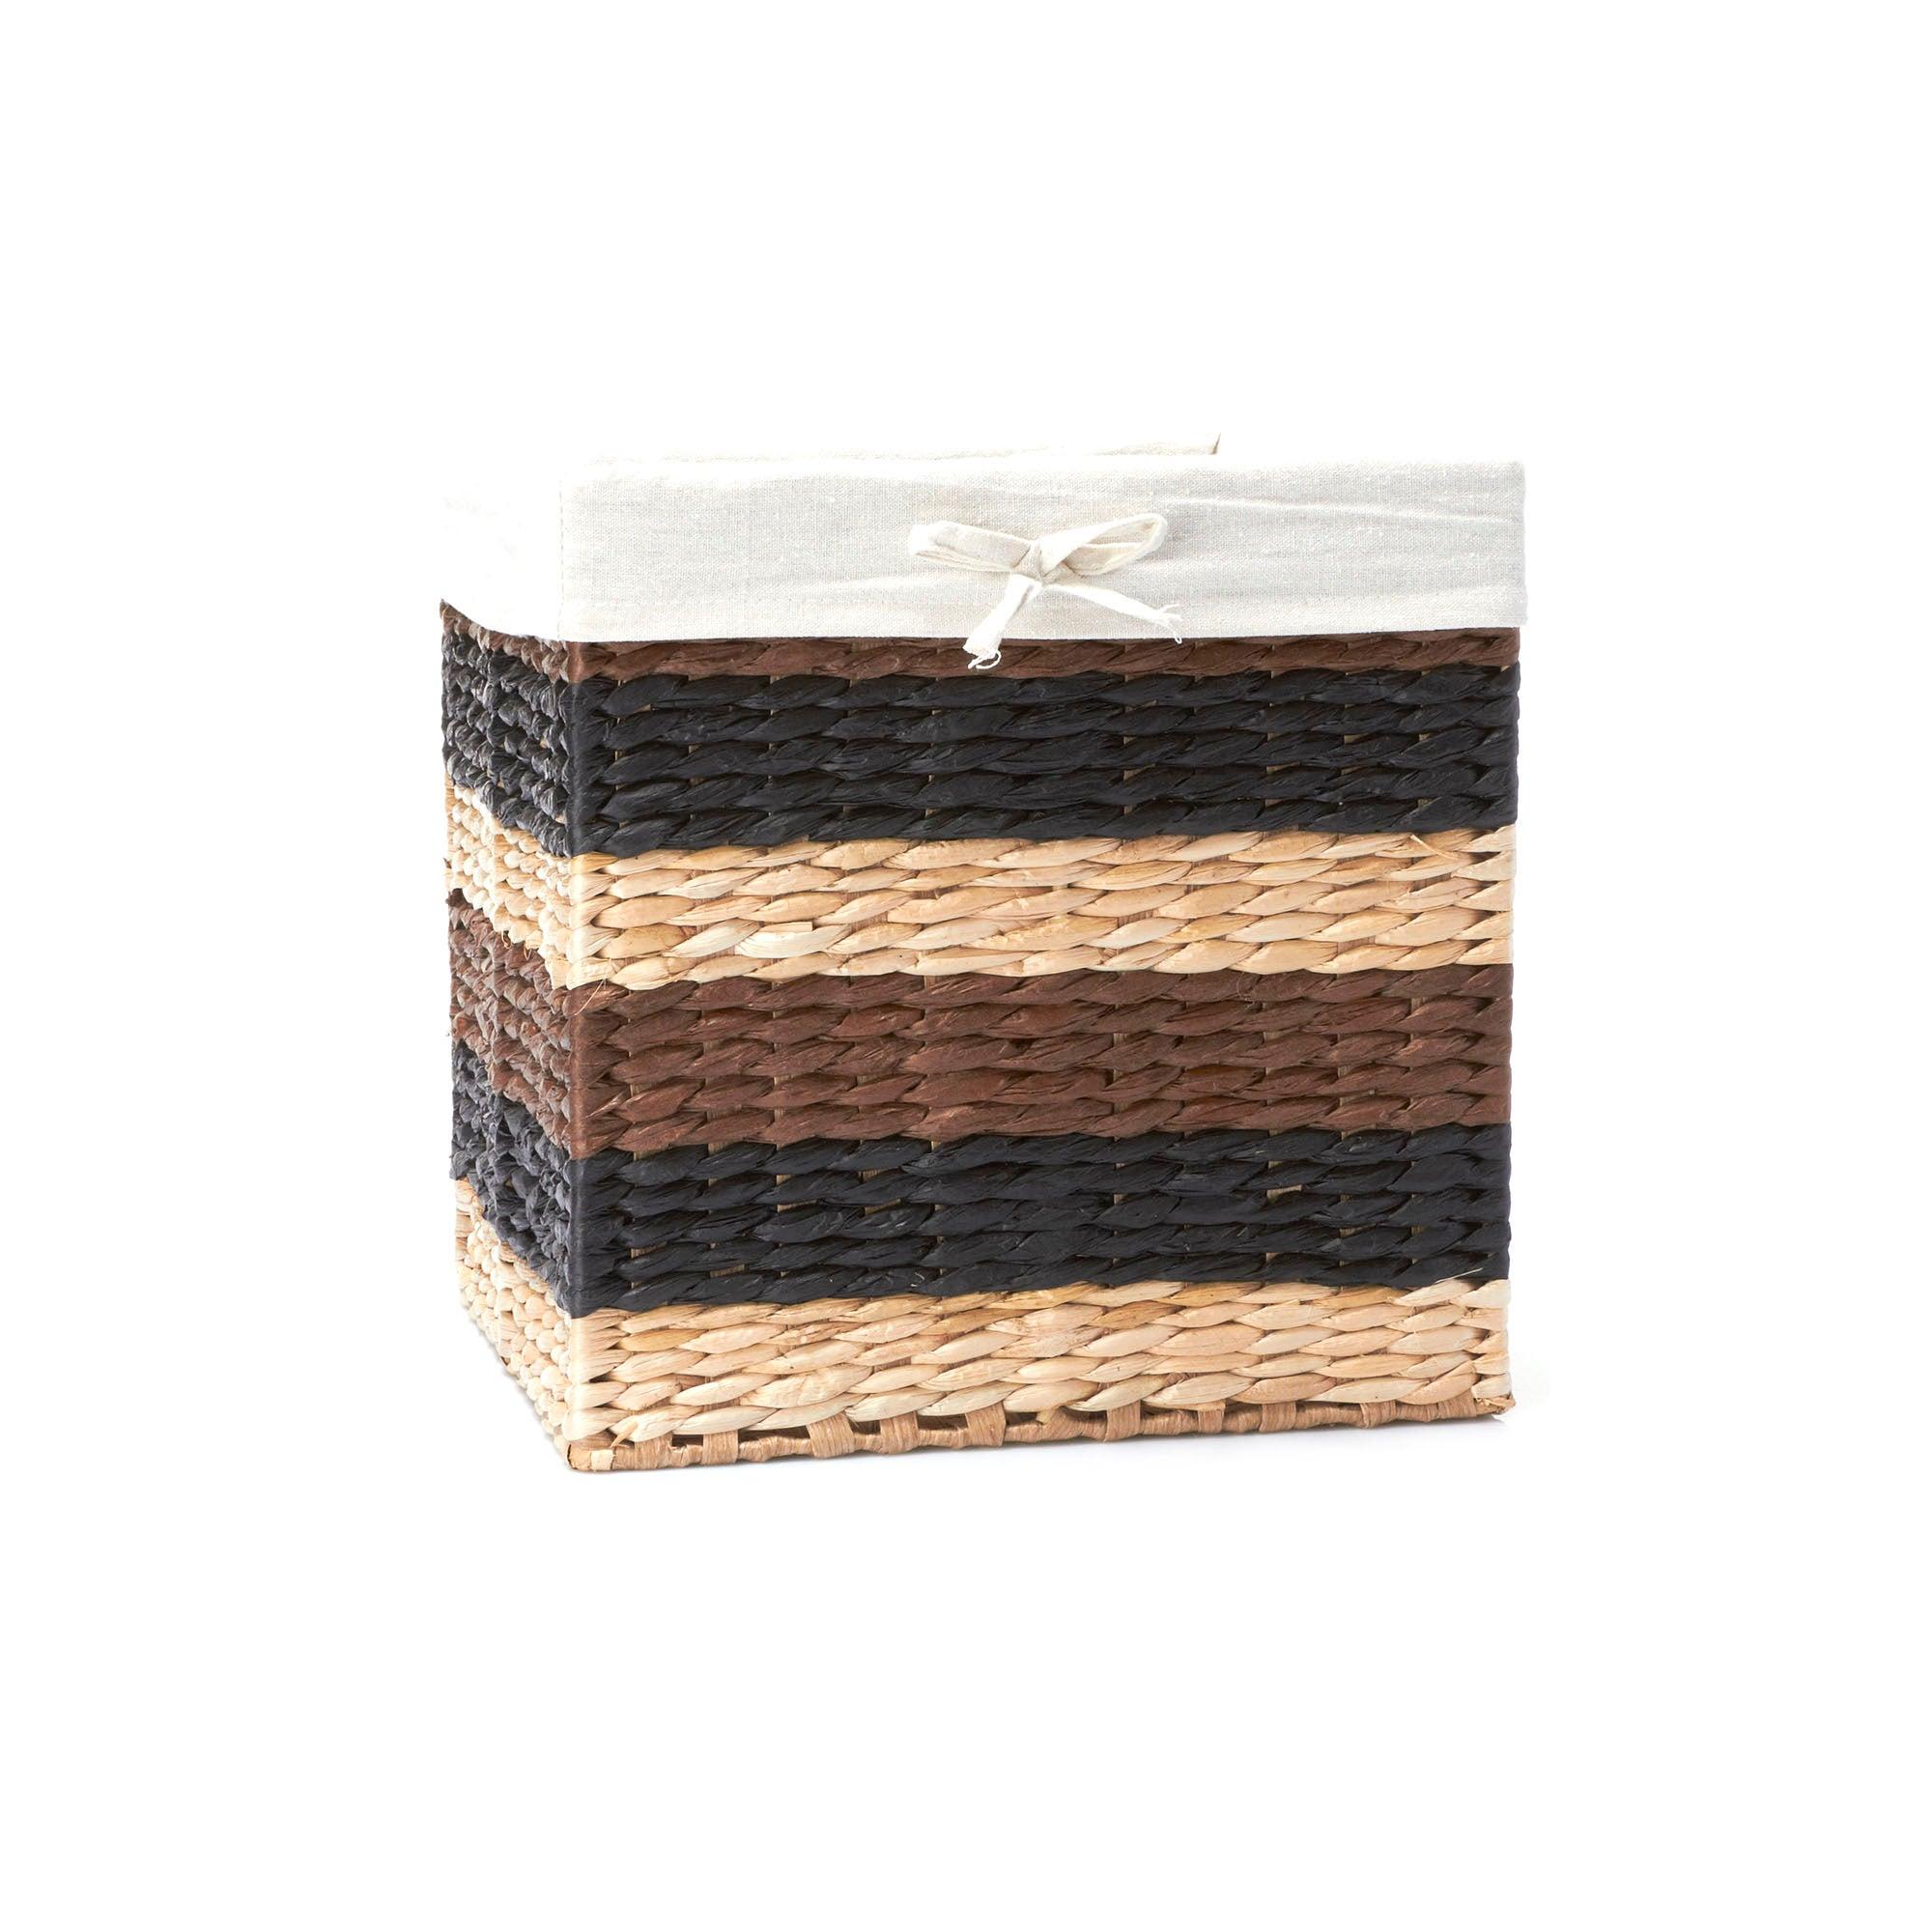 Stripe Square Wicker Basket